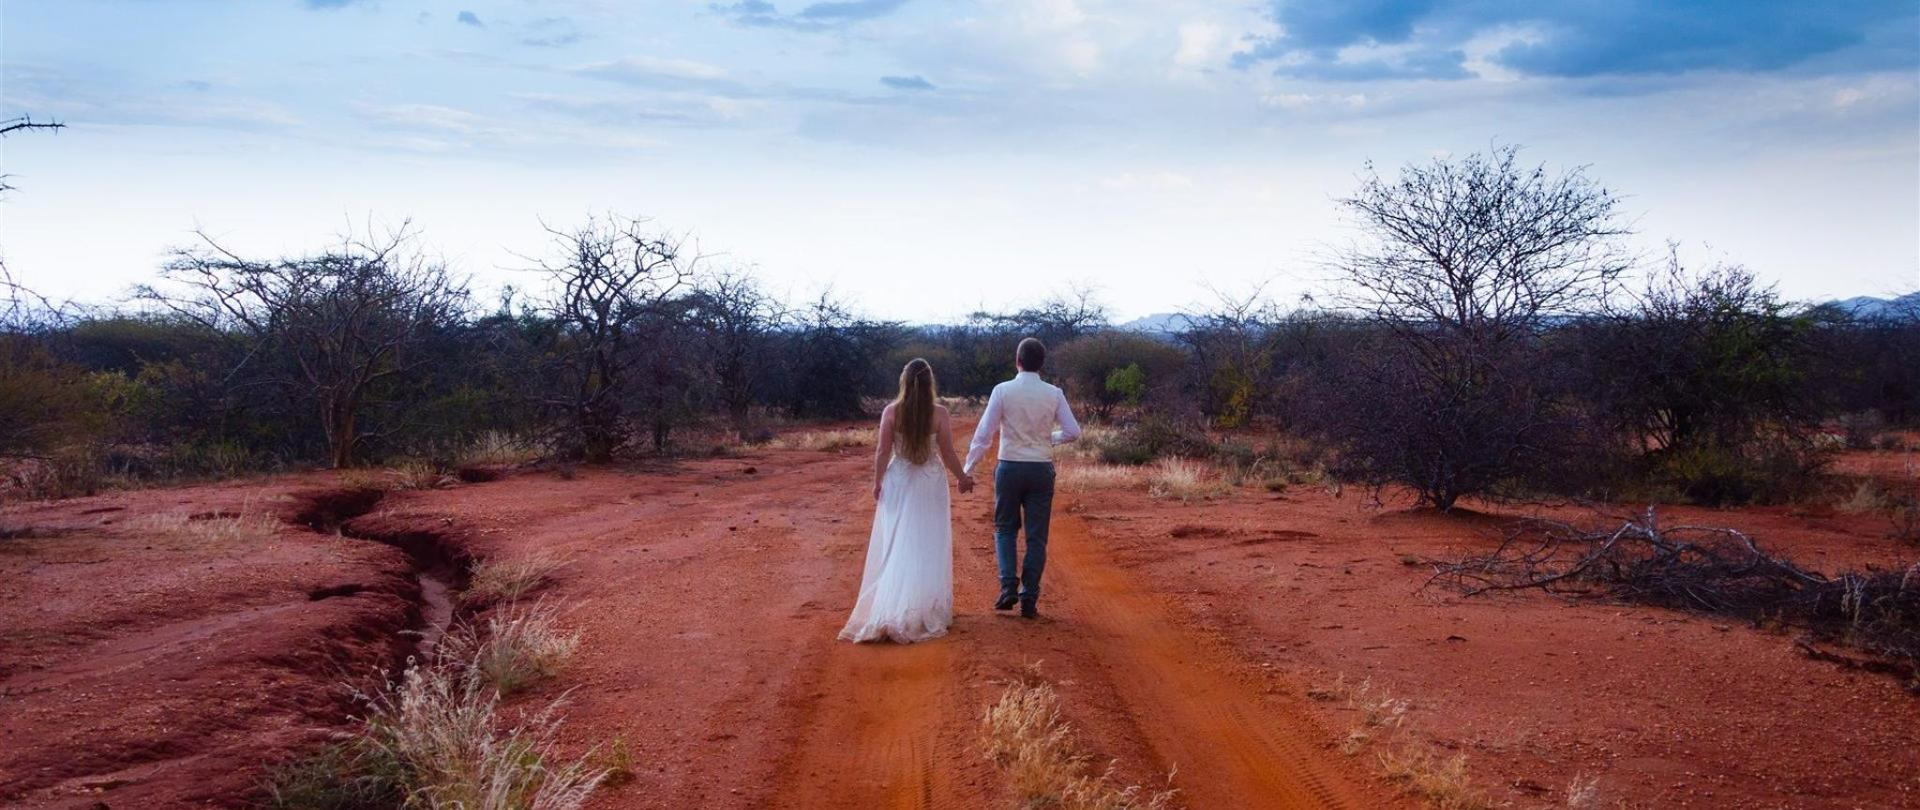 the-pathway-to-wedded-bliss-in-samburu.jpg